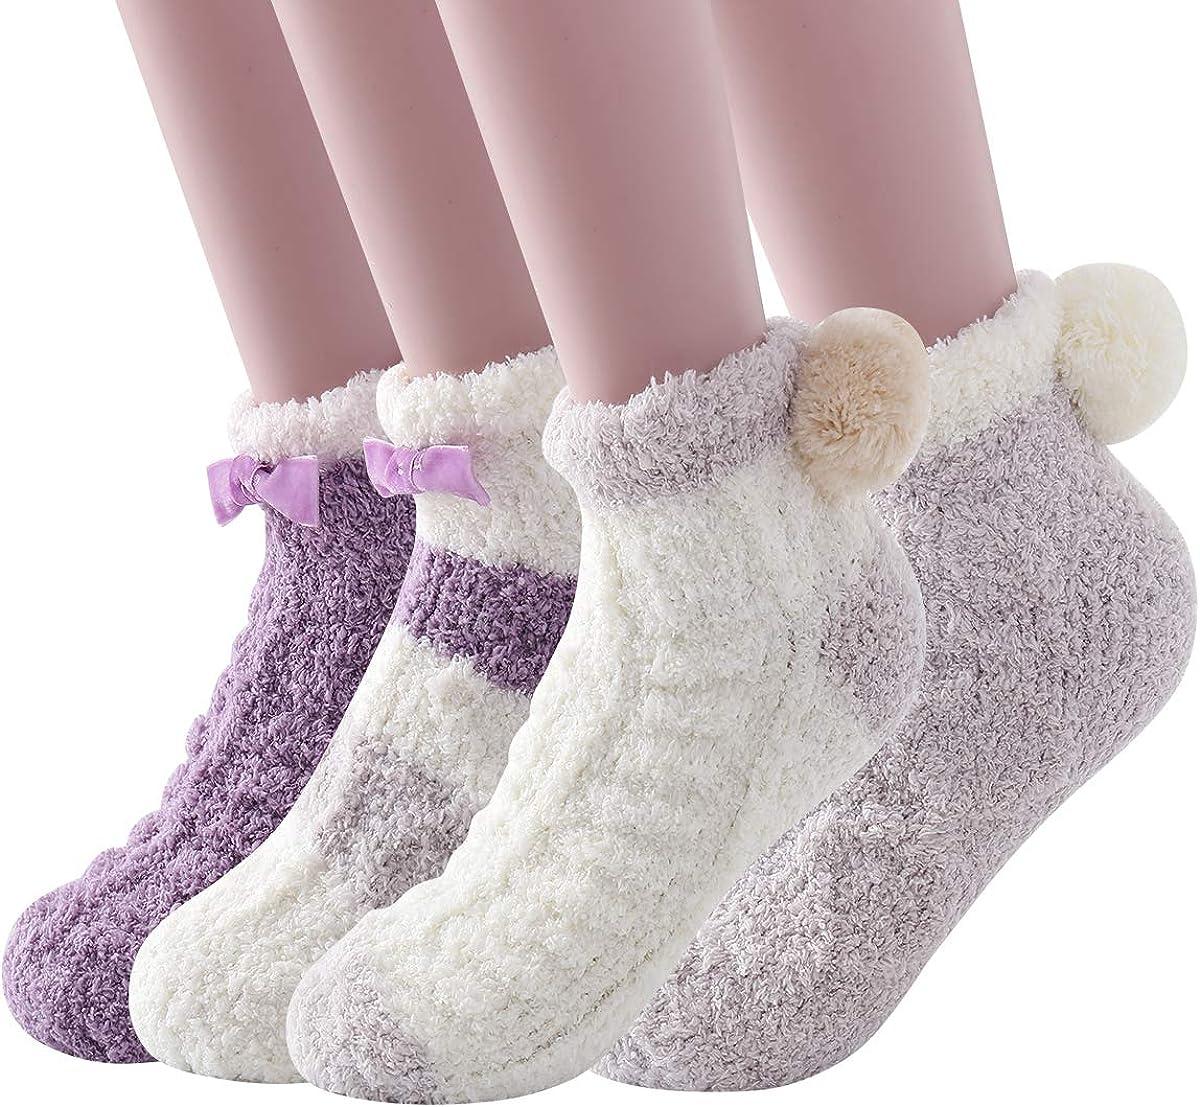 Skola Super Soft Cozy Winter Warm Slipper Socks Womens Anti Slip Grip Fuzzy Pom Pom Socks 4 Pairs